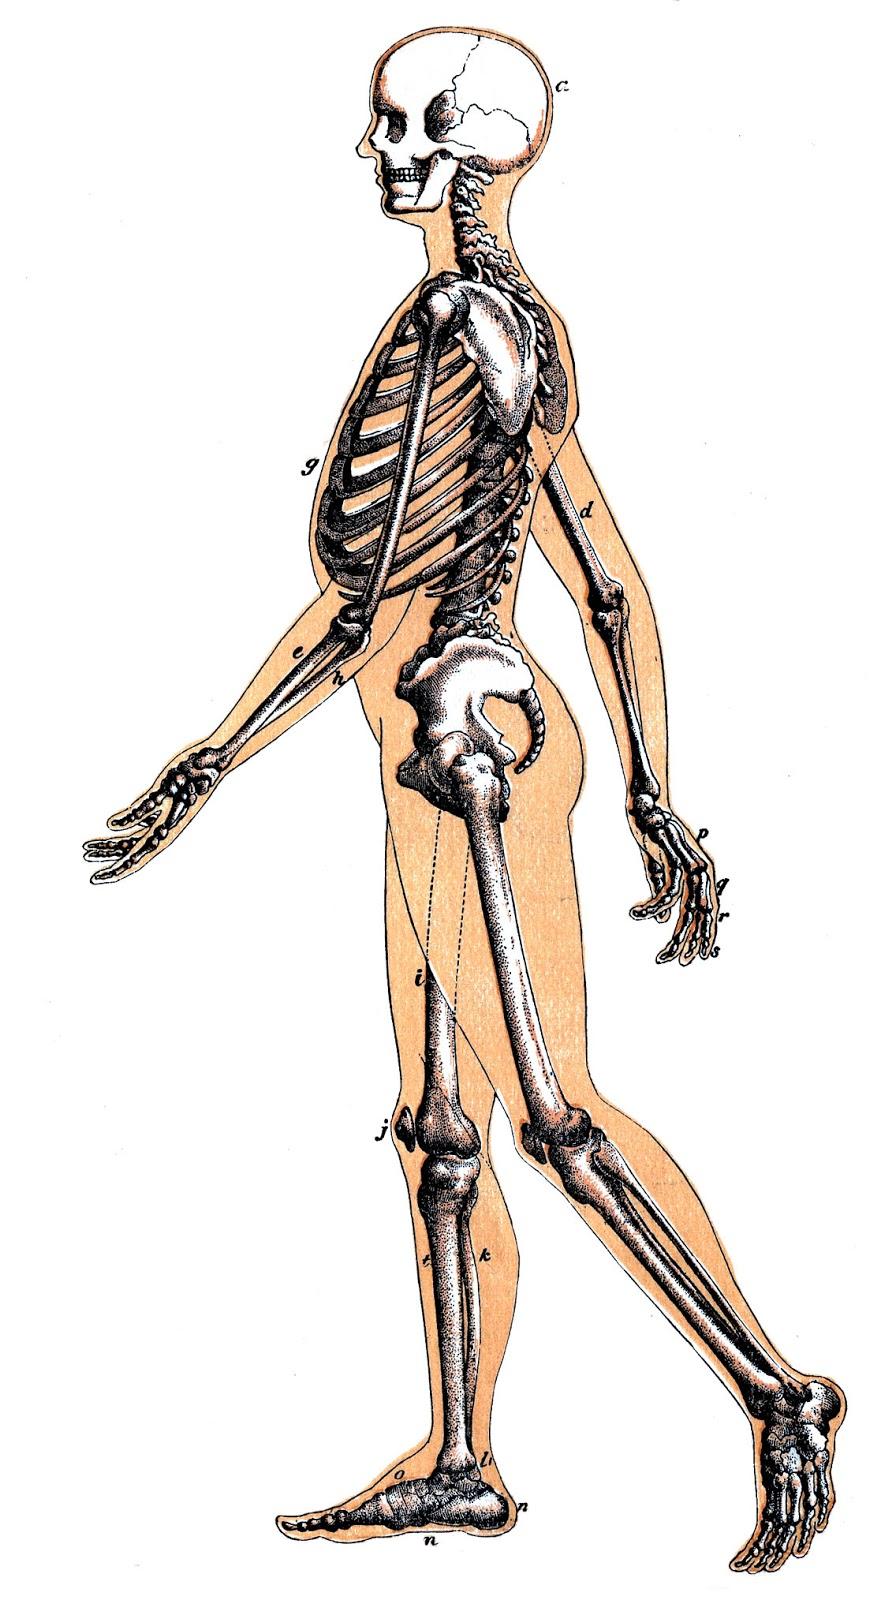 профиль скелета (анатомия)